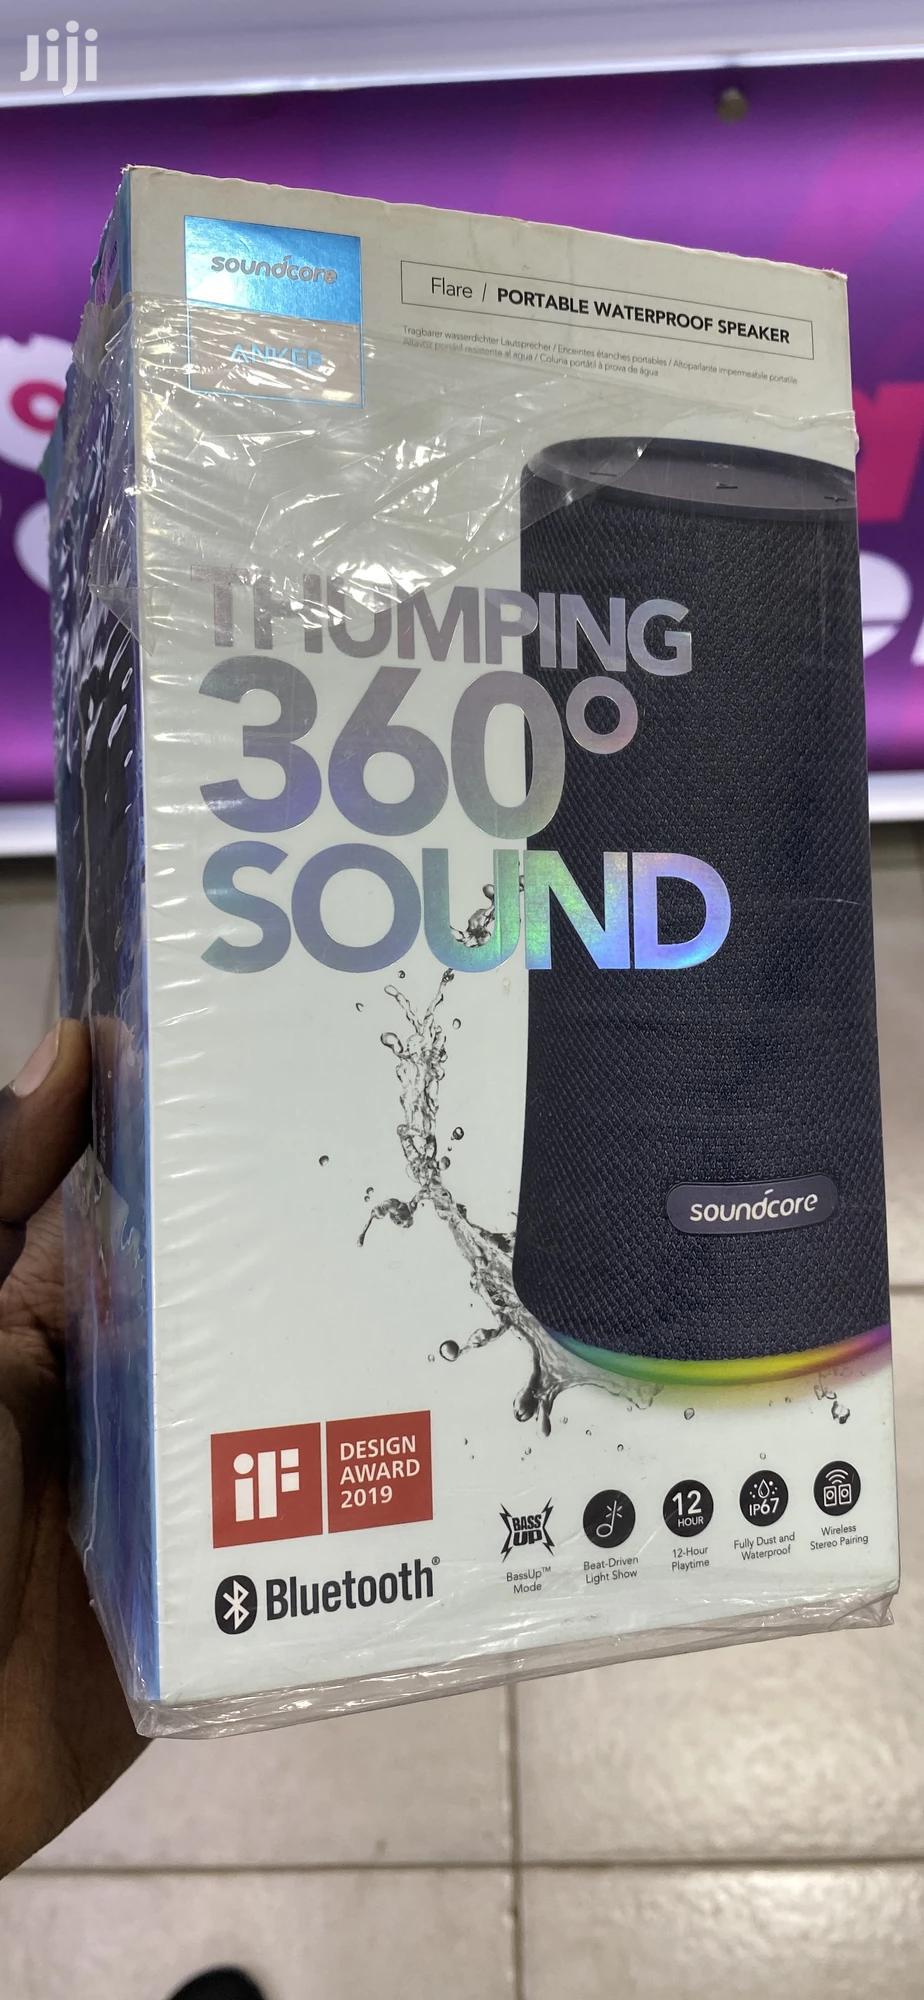 Anker Soundcore Waterproof Thumping Bass Bluetooth Speaker | Audio & Music Equipment for sale in Kampala, Central Region, Uganda